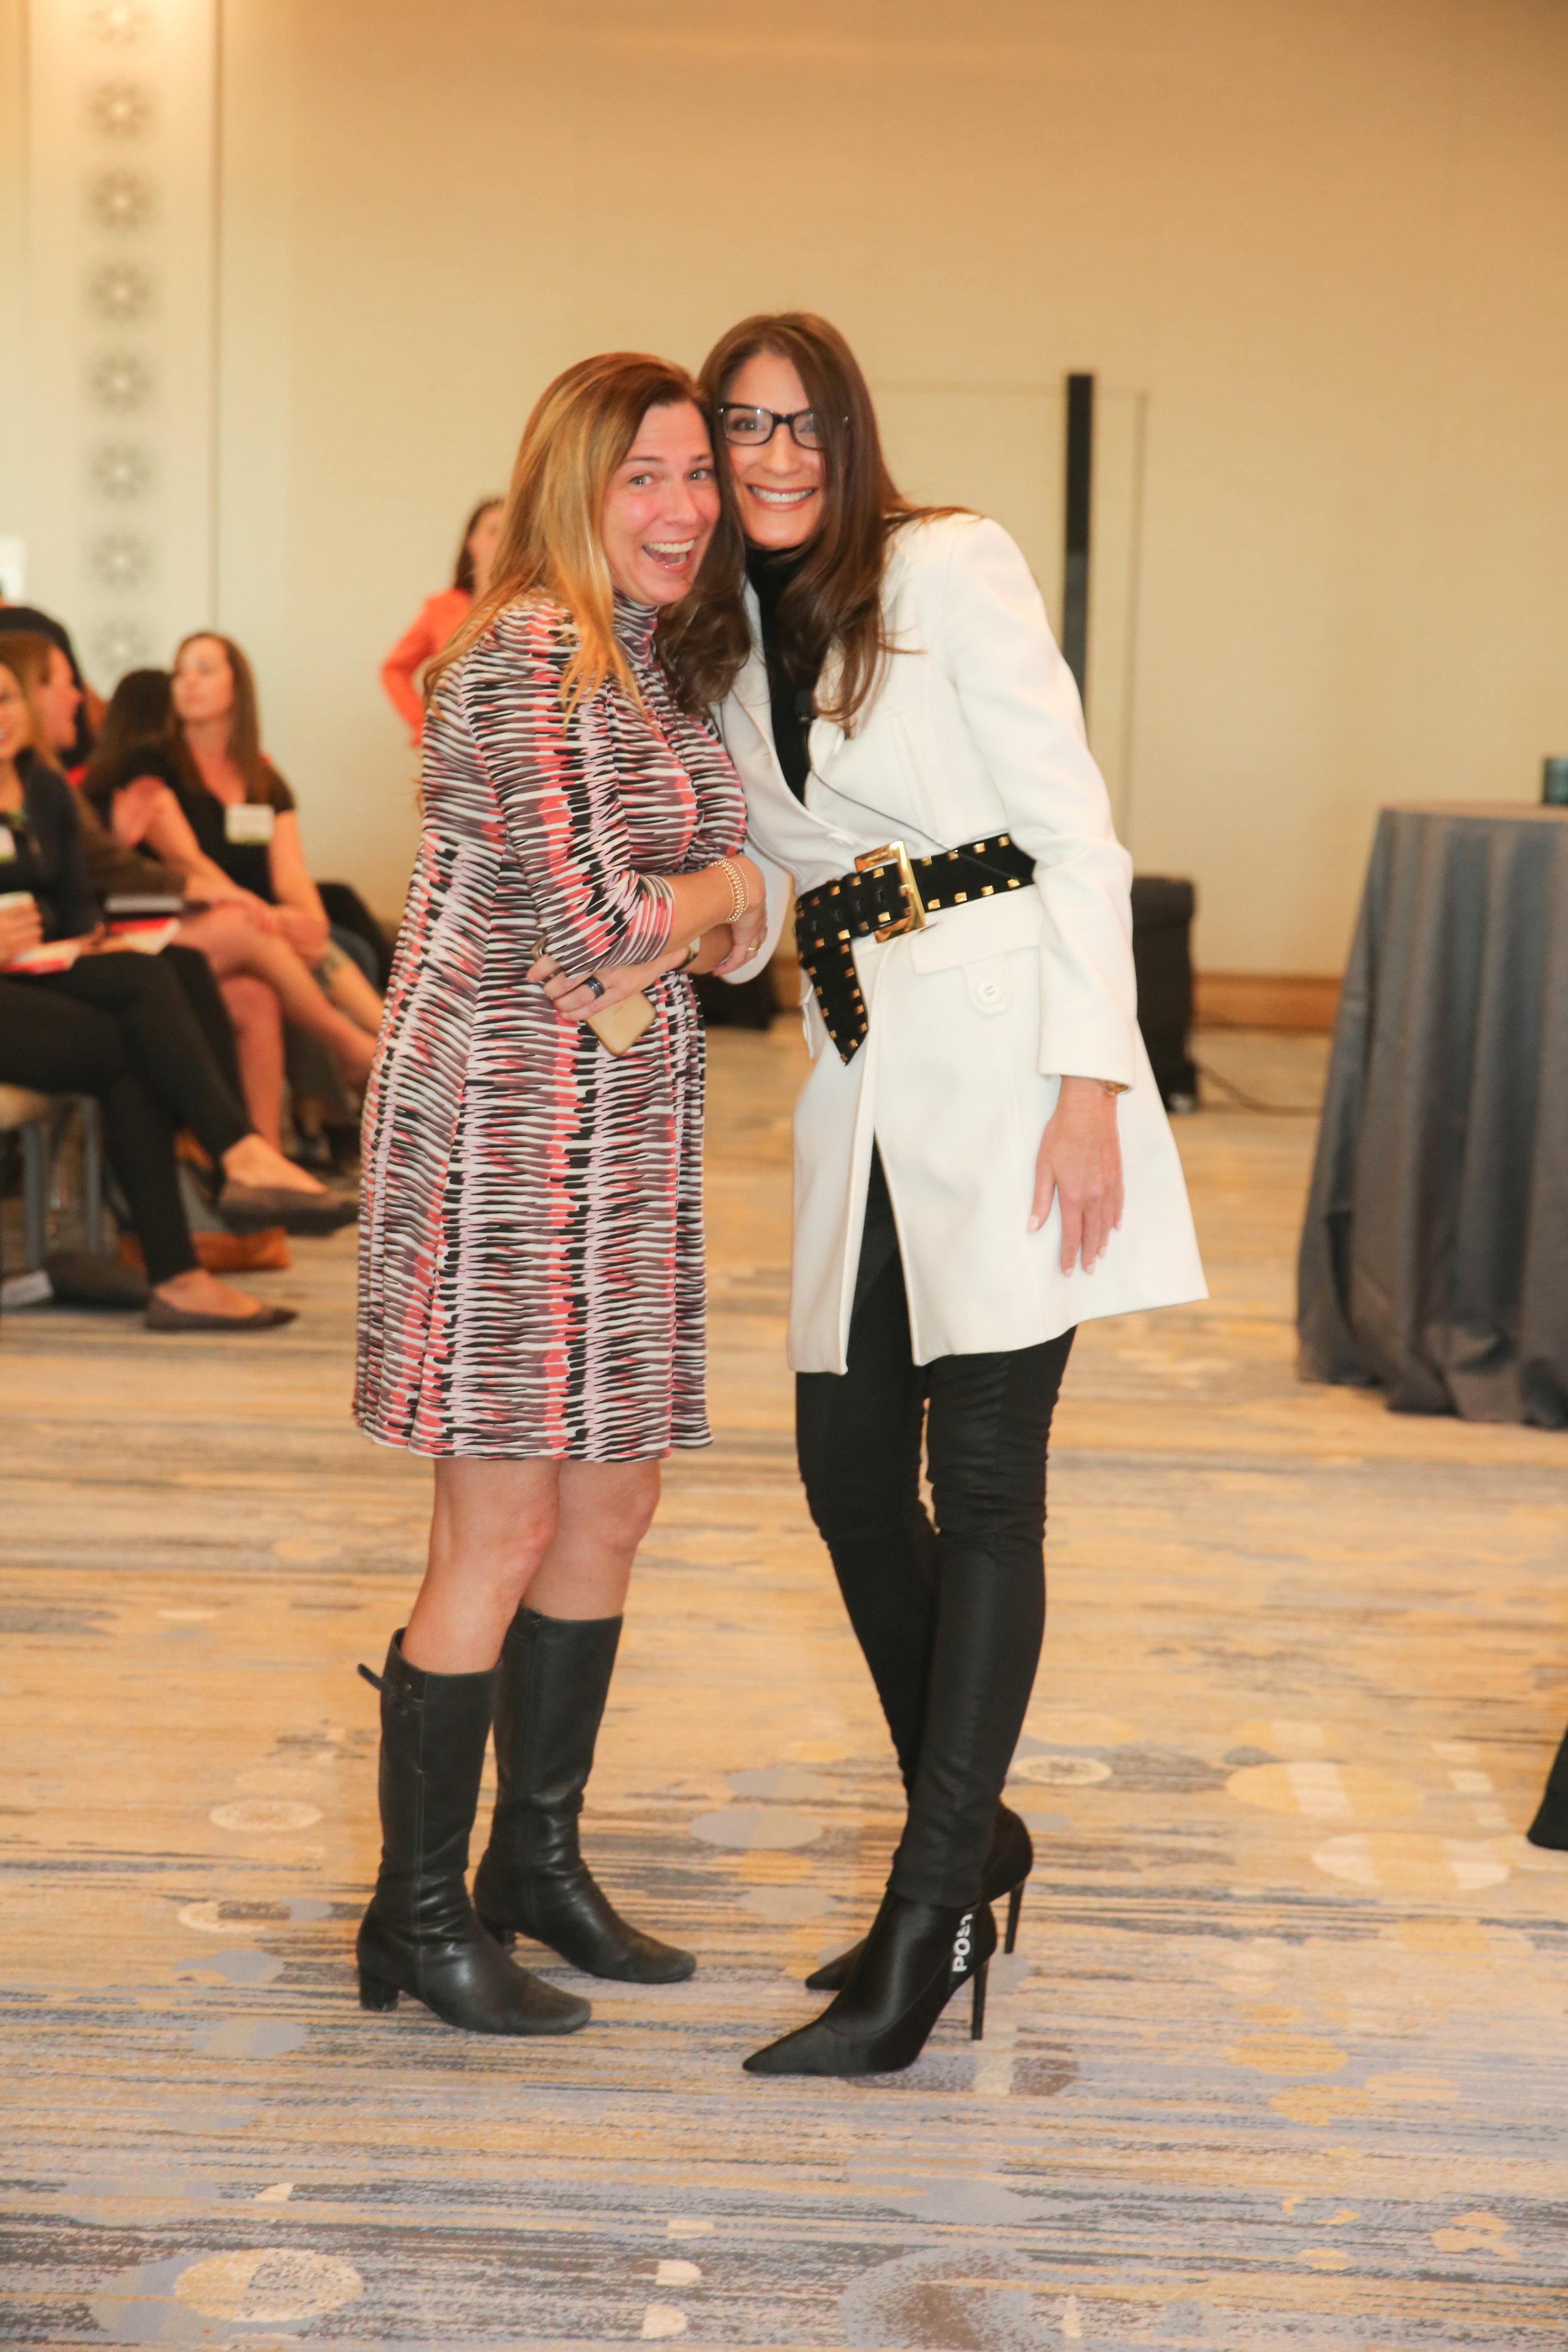 #TamiHolzman Tami Holzman #Keynotespeaker, Keynote Speaker, #emotionalintellegence Emotional Intelligence, #eq #csuite C-Suite #sales Sales #Author #Writer #Speaker, Author, female empowerment, #Business Business #Press Press#speaker speaker #urbanlandinstitute#ULI